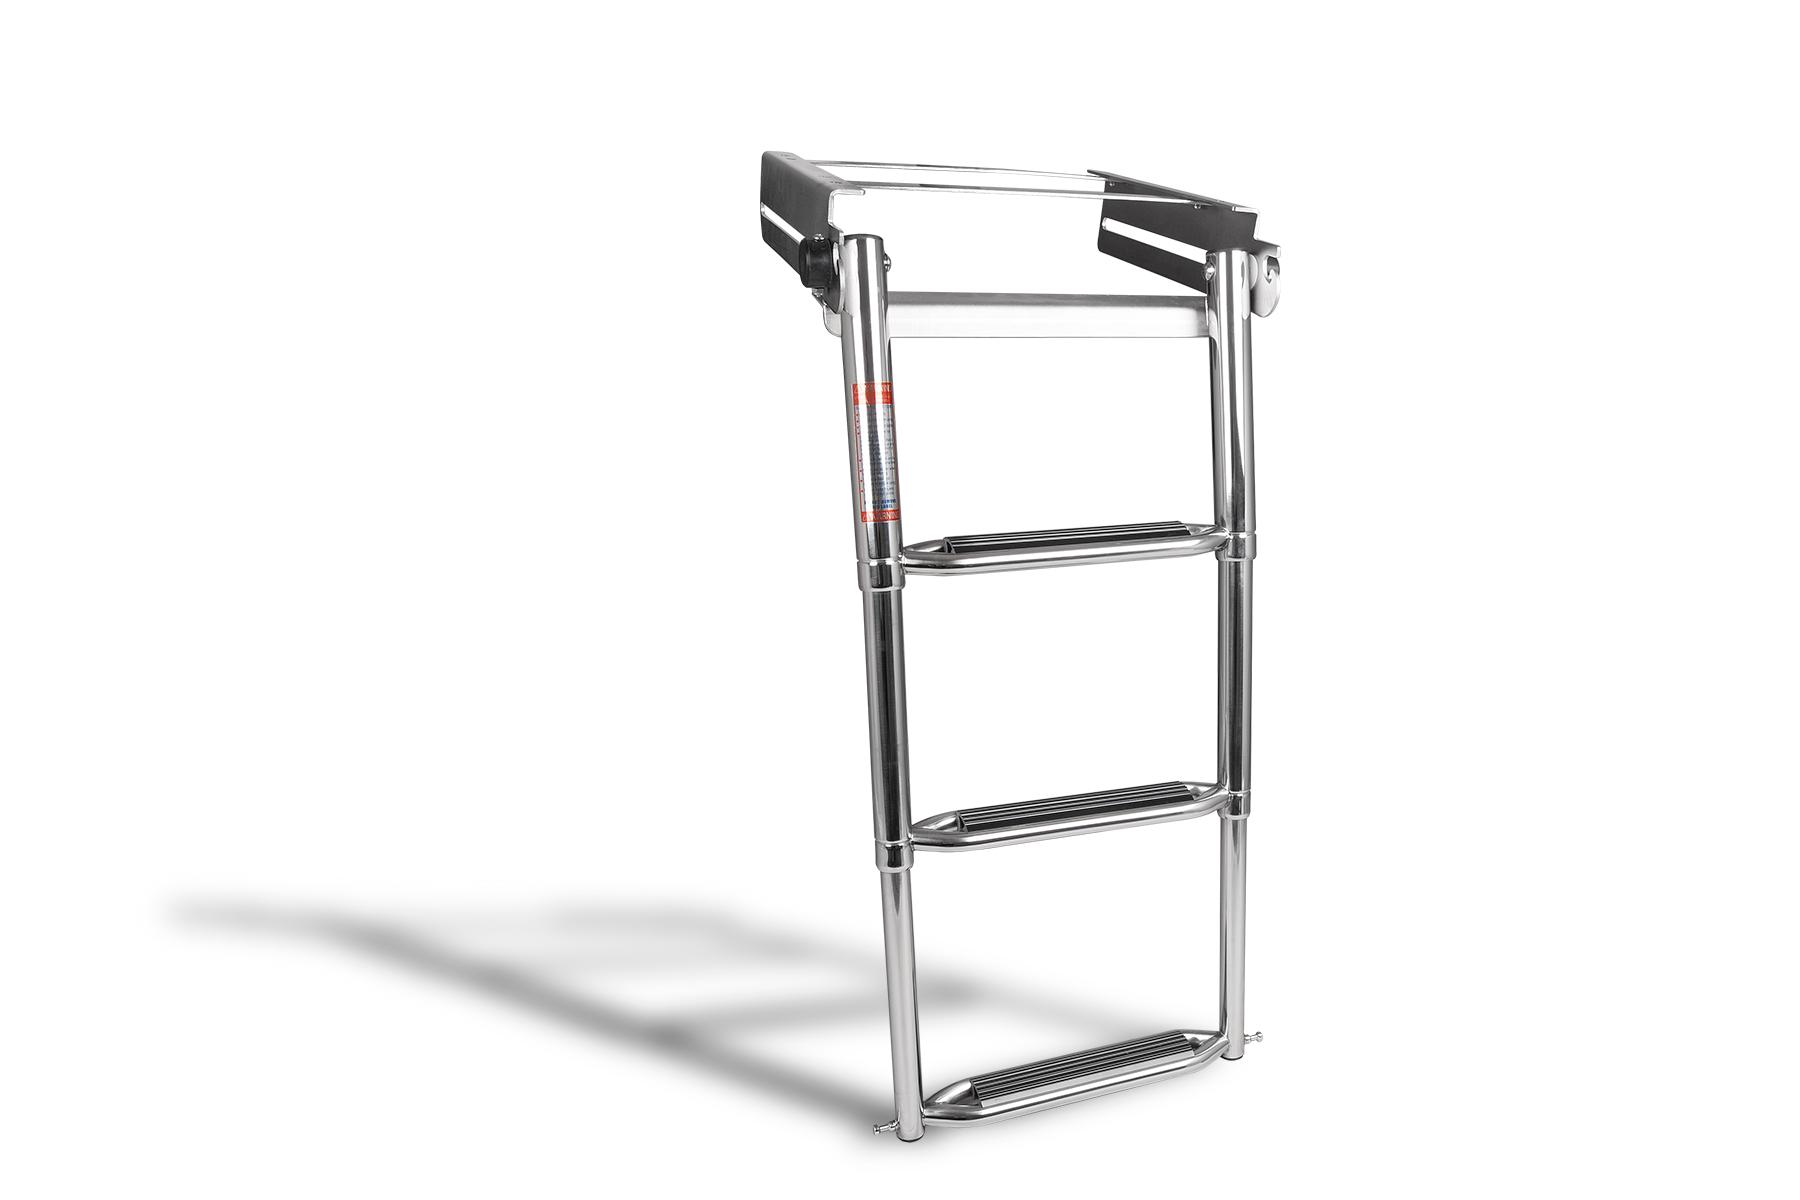 Telescoping Ladder